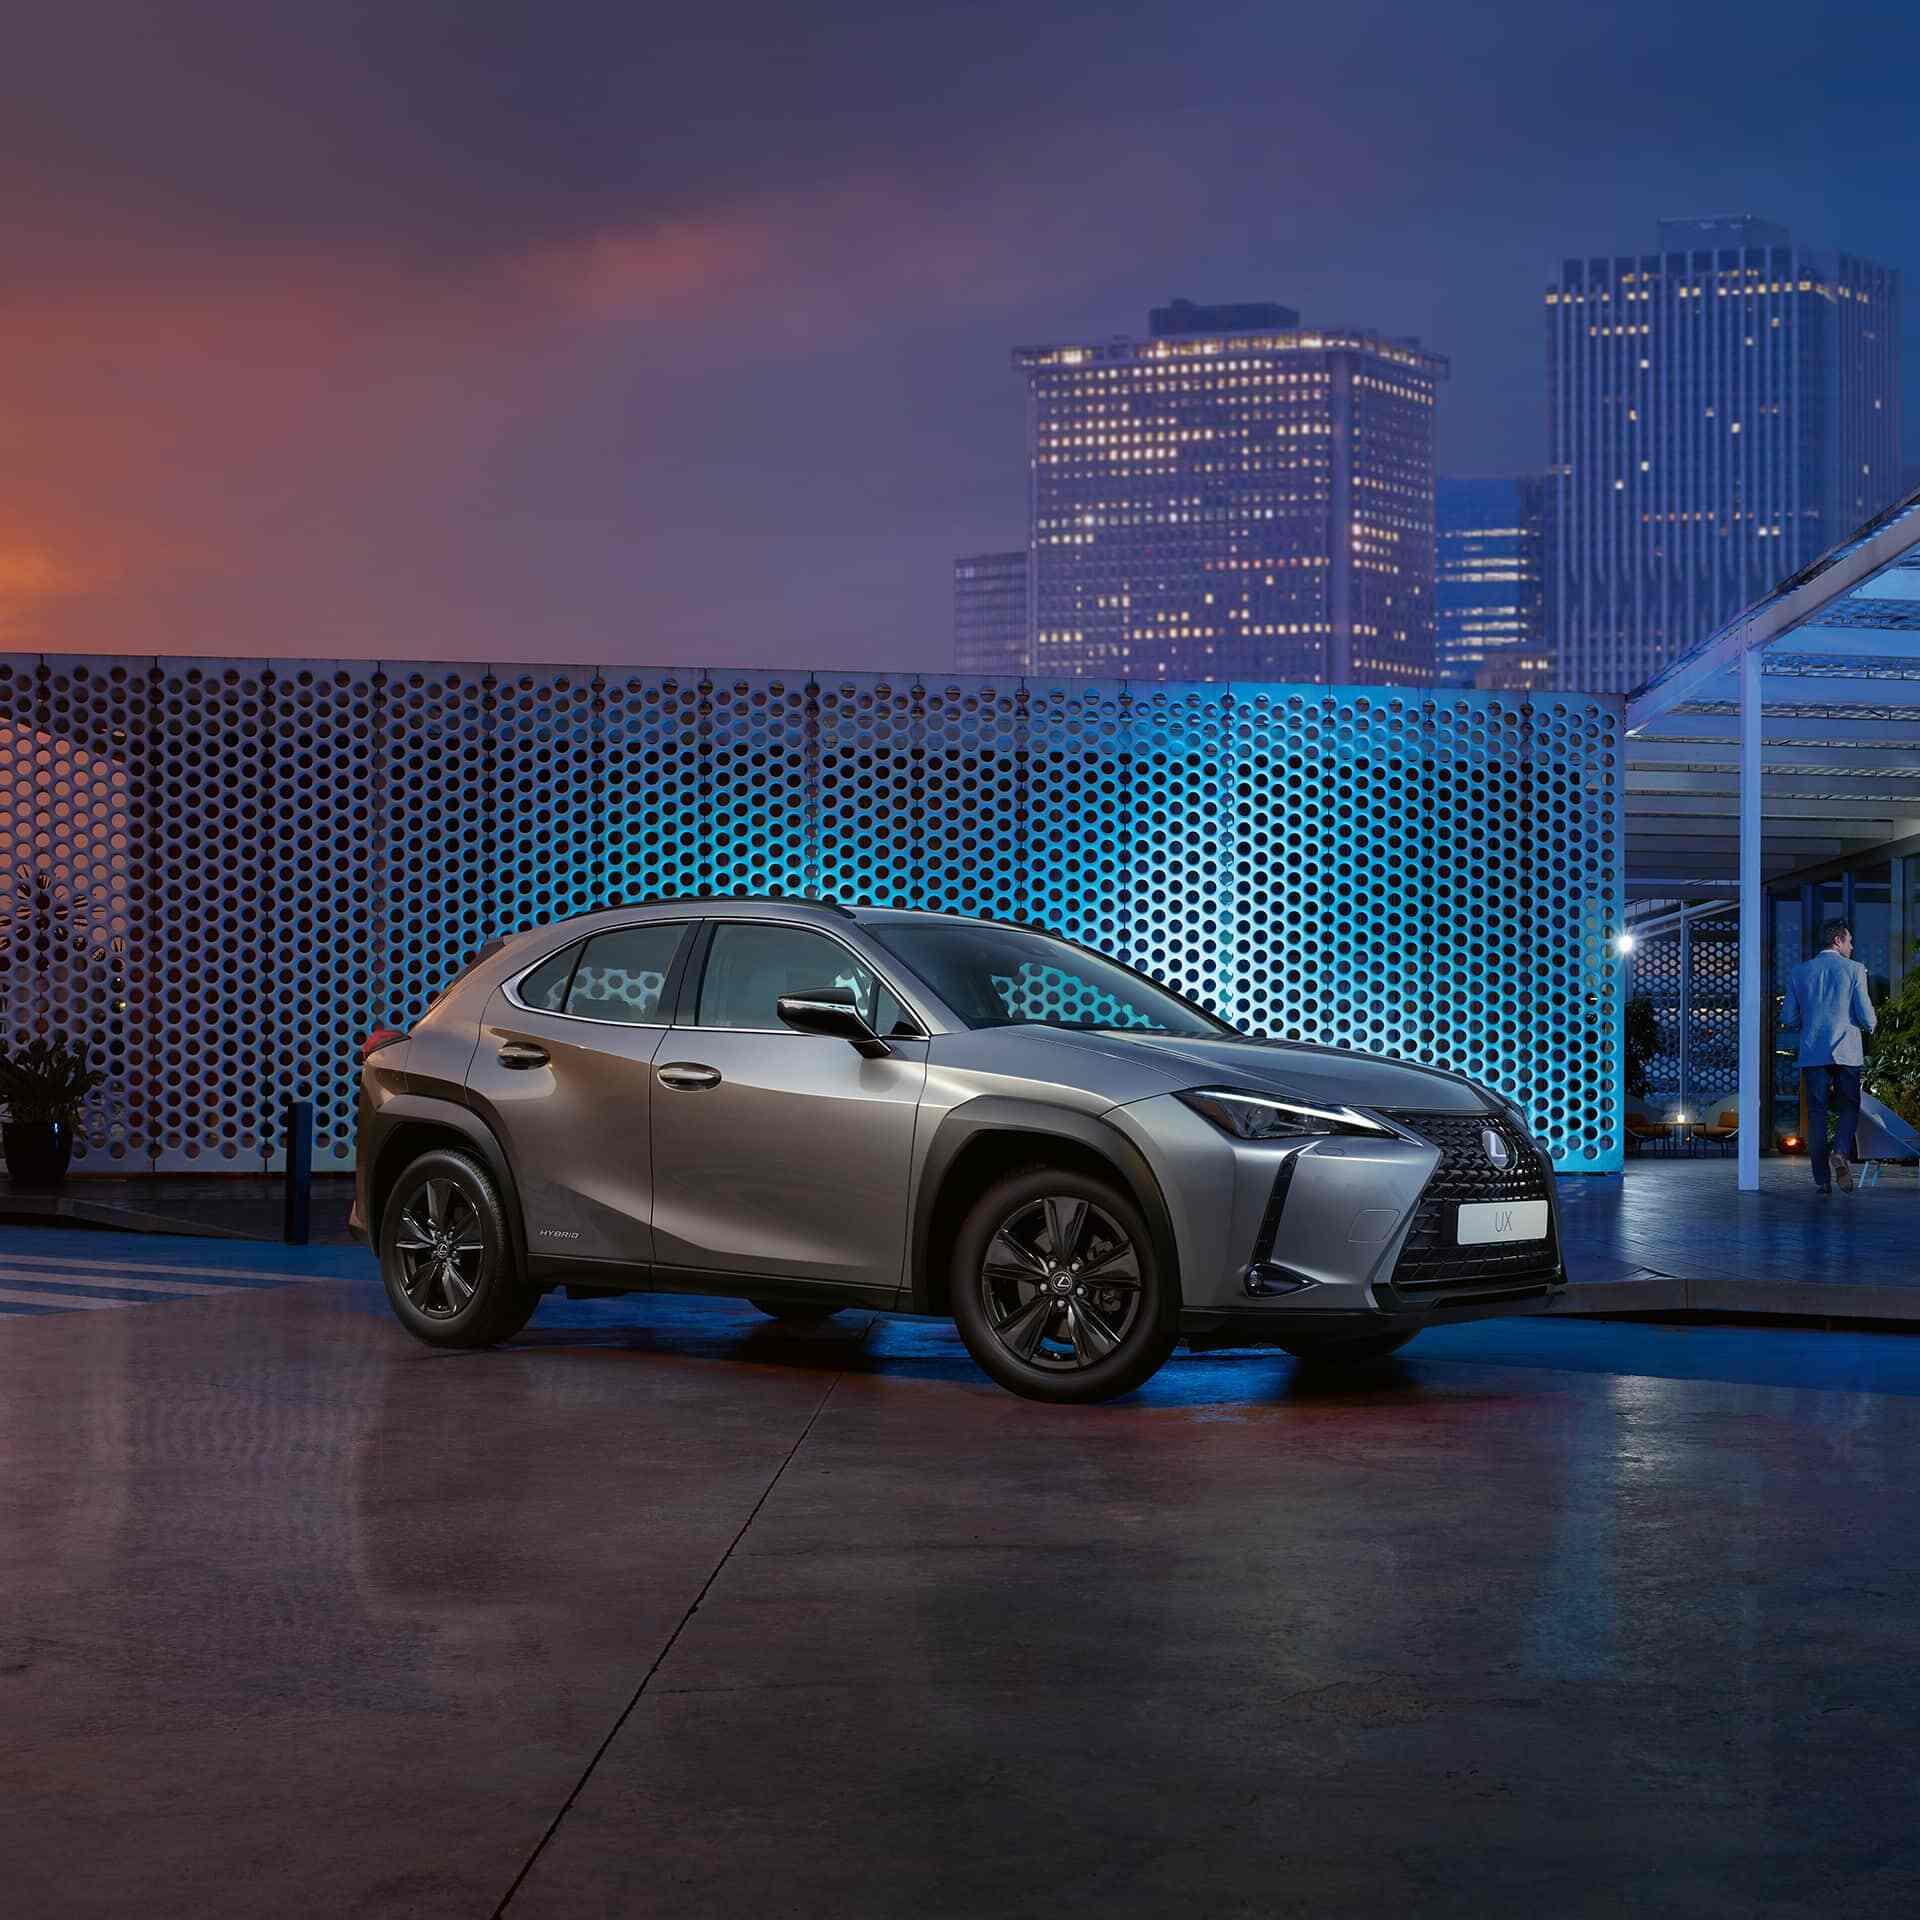 Vit Lexus UX 250h F SPORT 2019